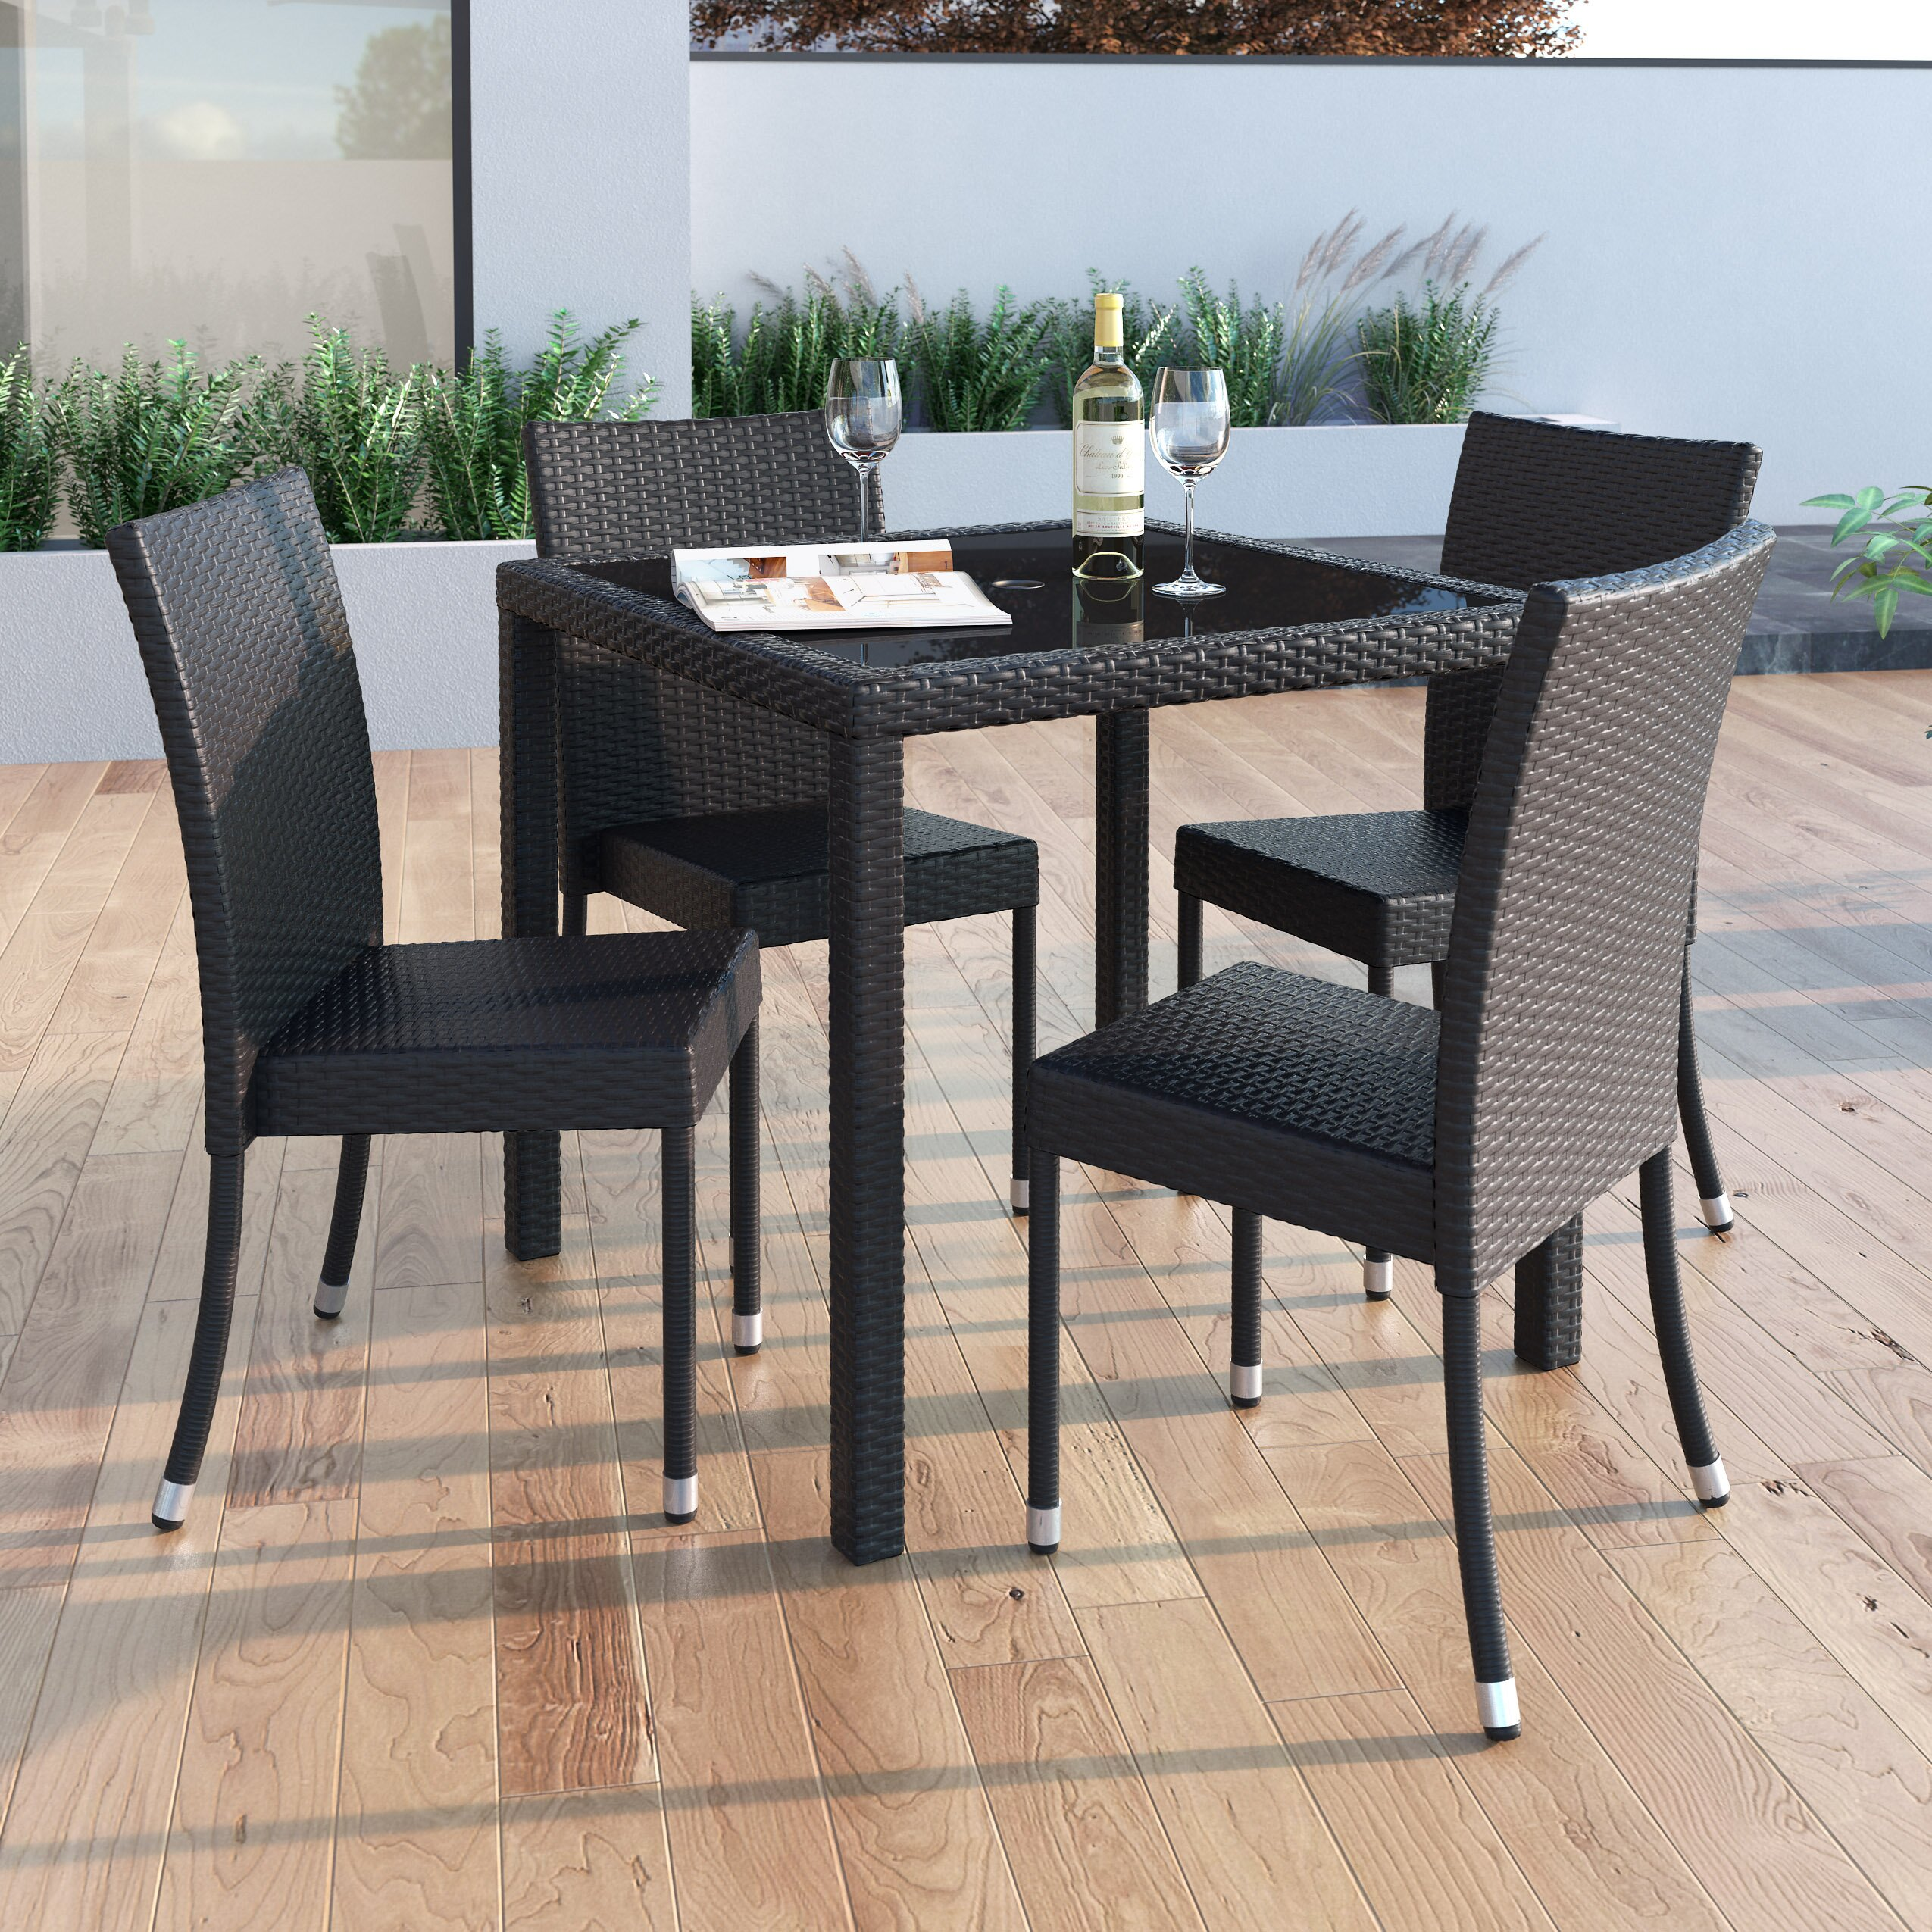 dcor design park terrace dining table reviews. Black Bedroom Furniture Sets. Home Design Ideas